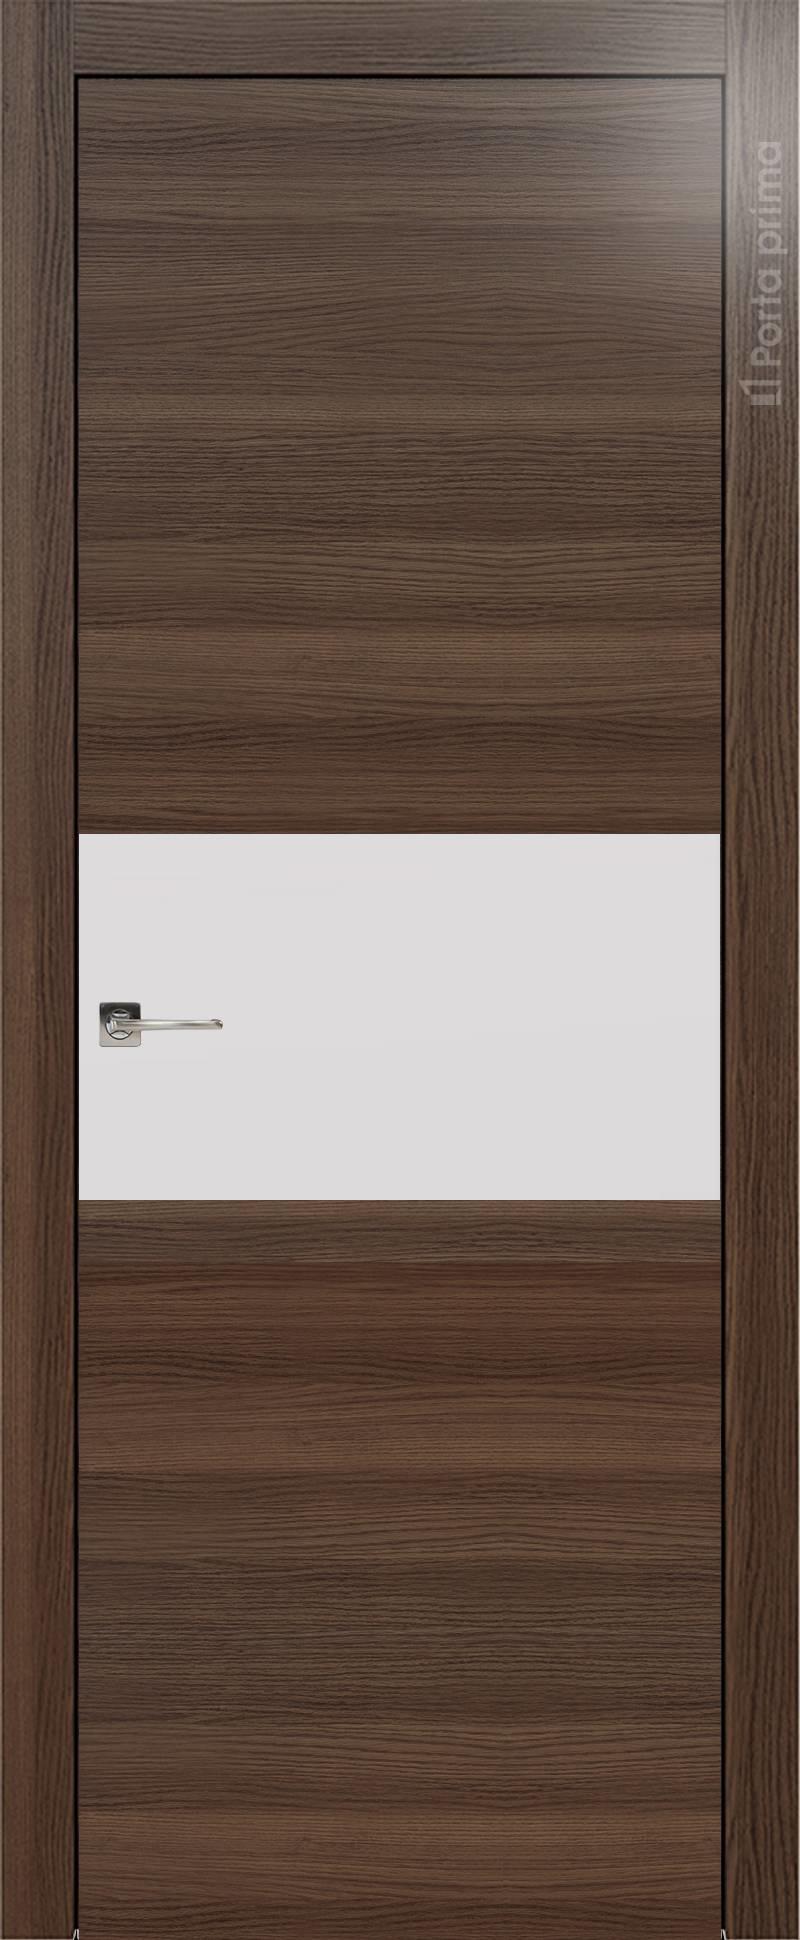 Tivoli Е-4 цвет - Дуб торонто Без стекла (ДГ)